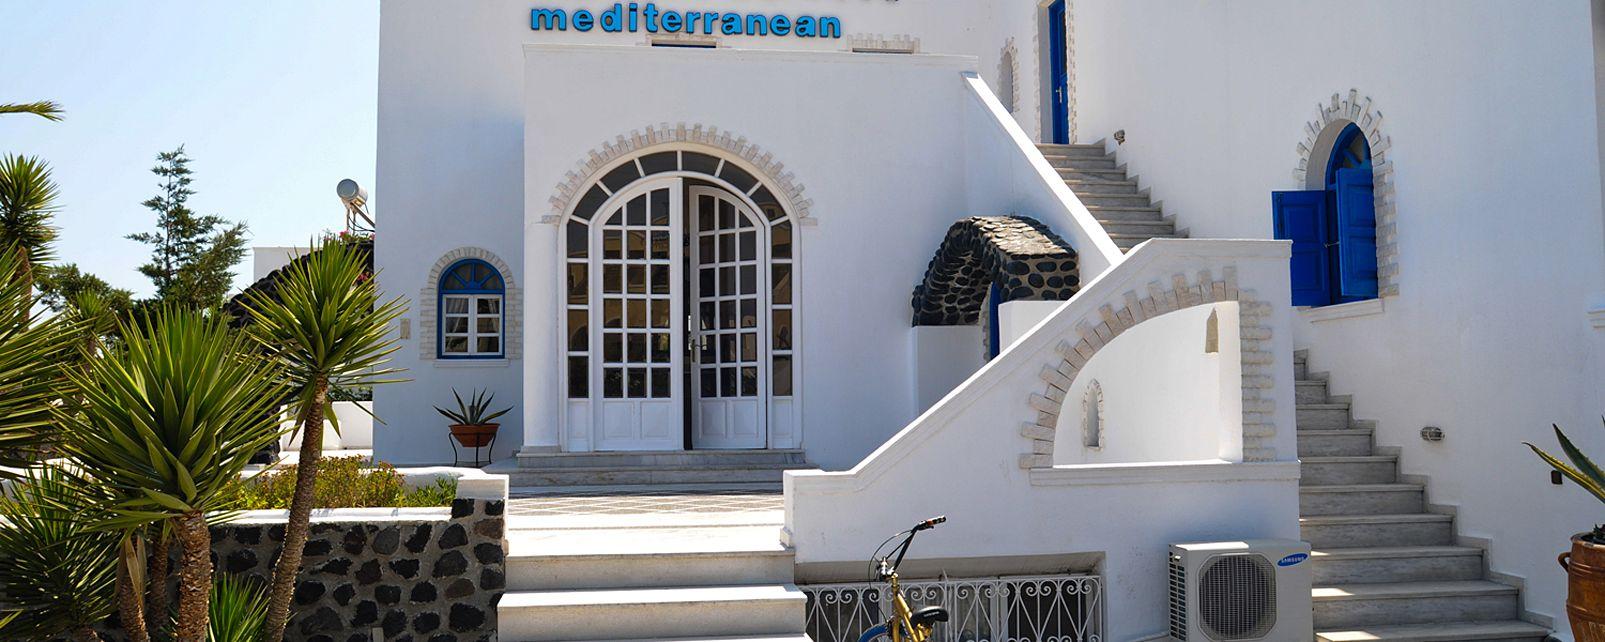 Hôtel Mediterranean Palace Hotel